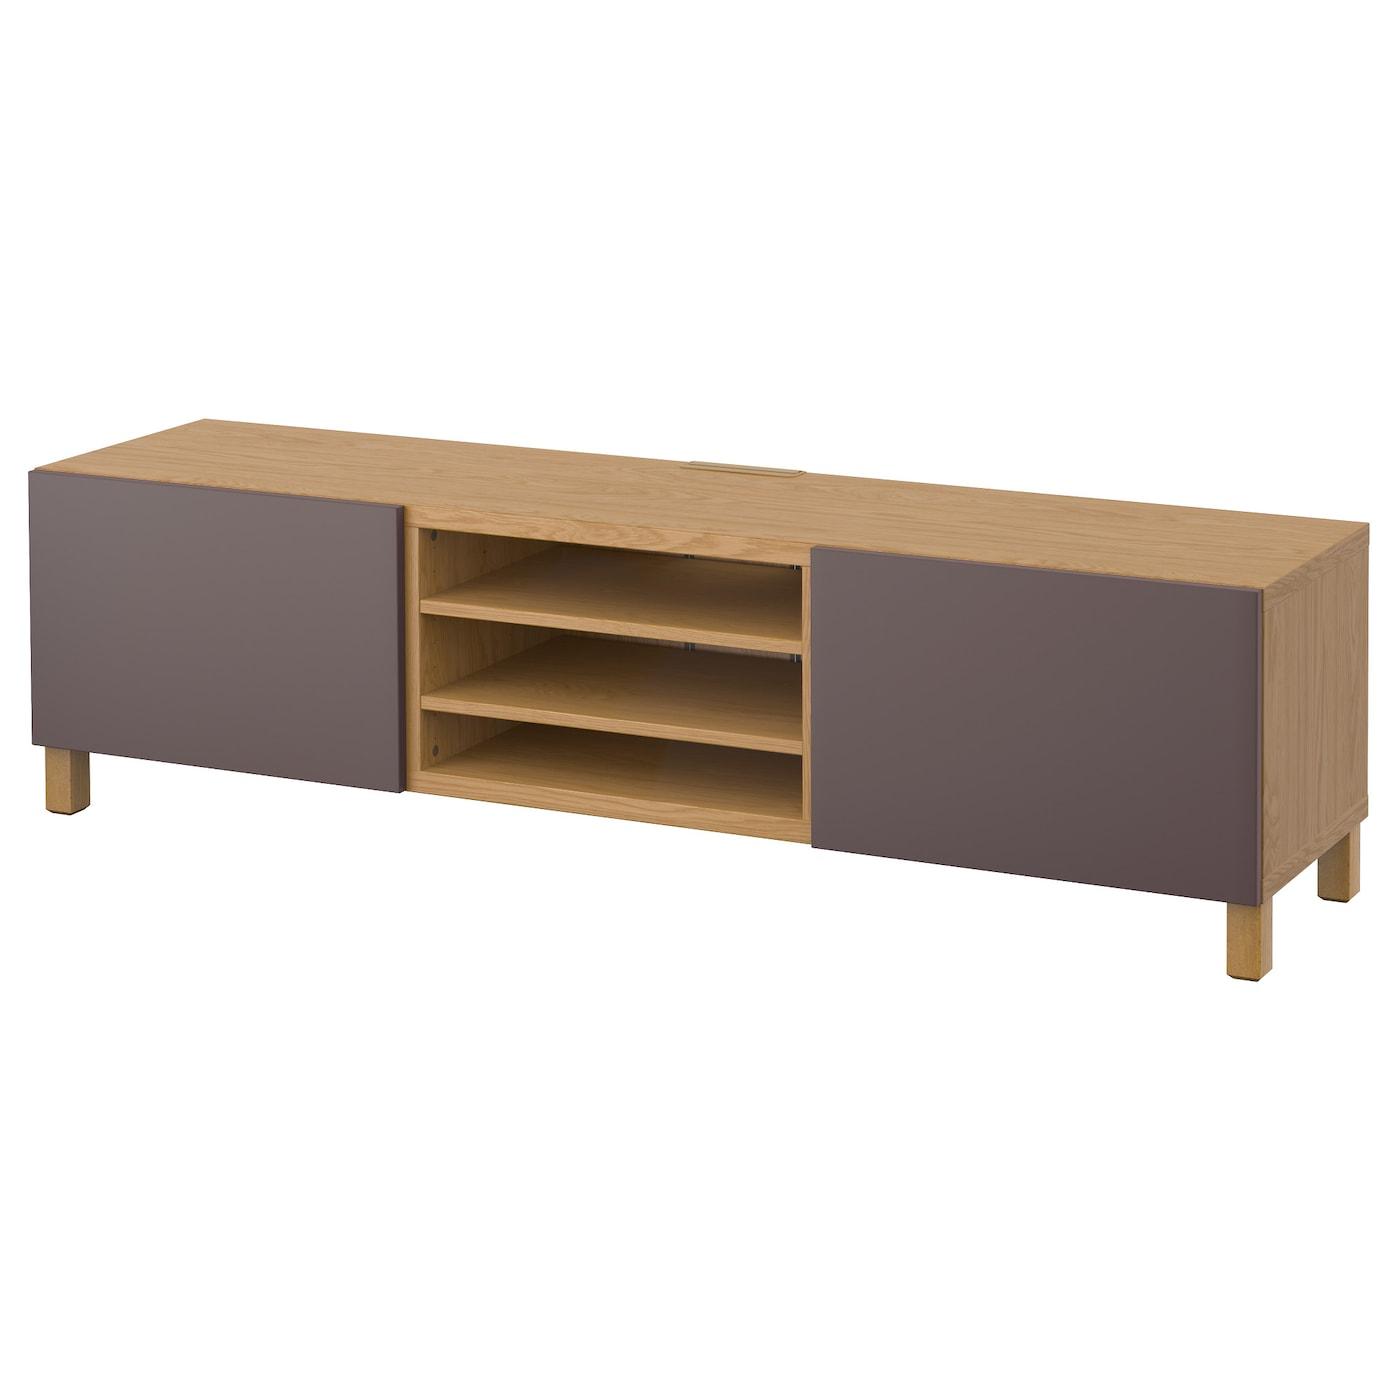 Best Tv Bench With Drawers Oak Effect Valviken Dark Brown 180x40x48 Cm Ikea